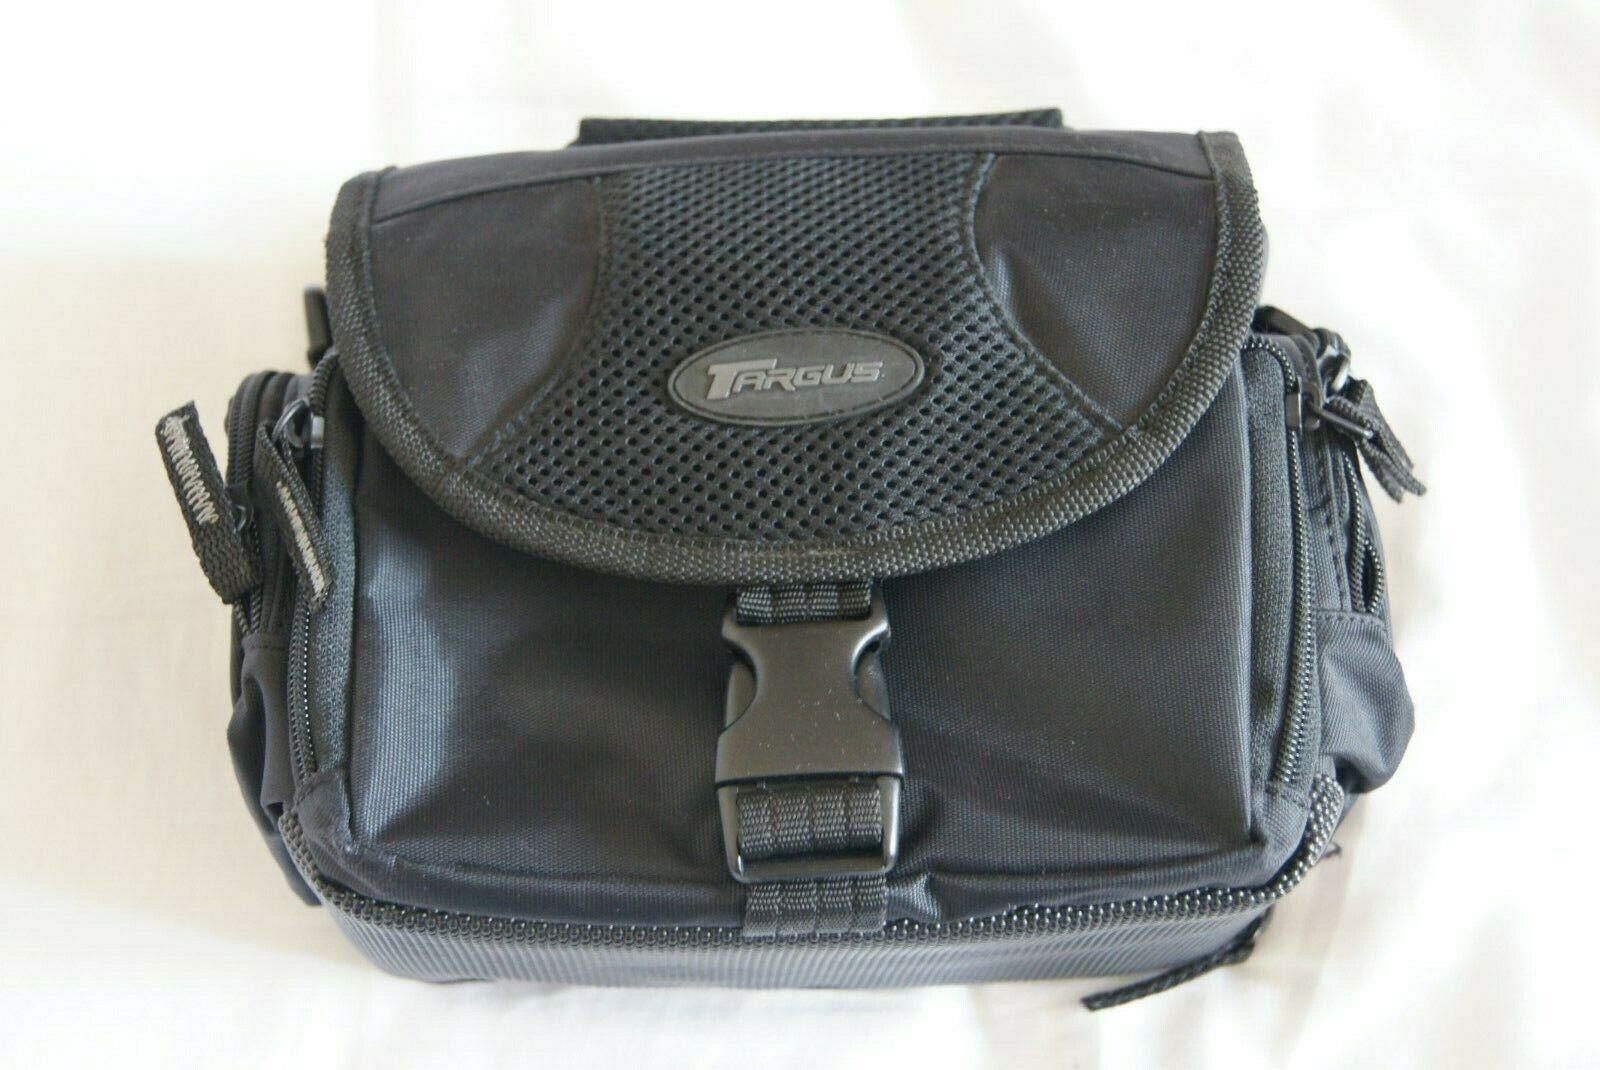 Targus Camera Bag in Black Very Good Condition